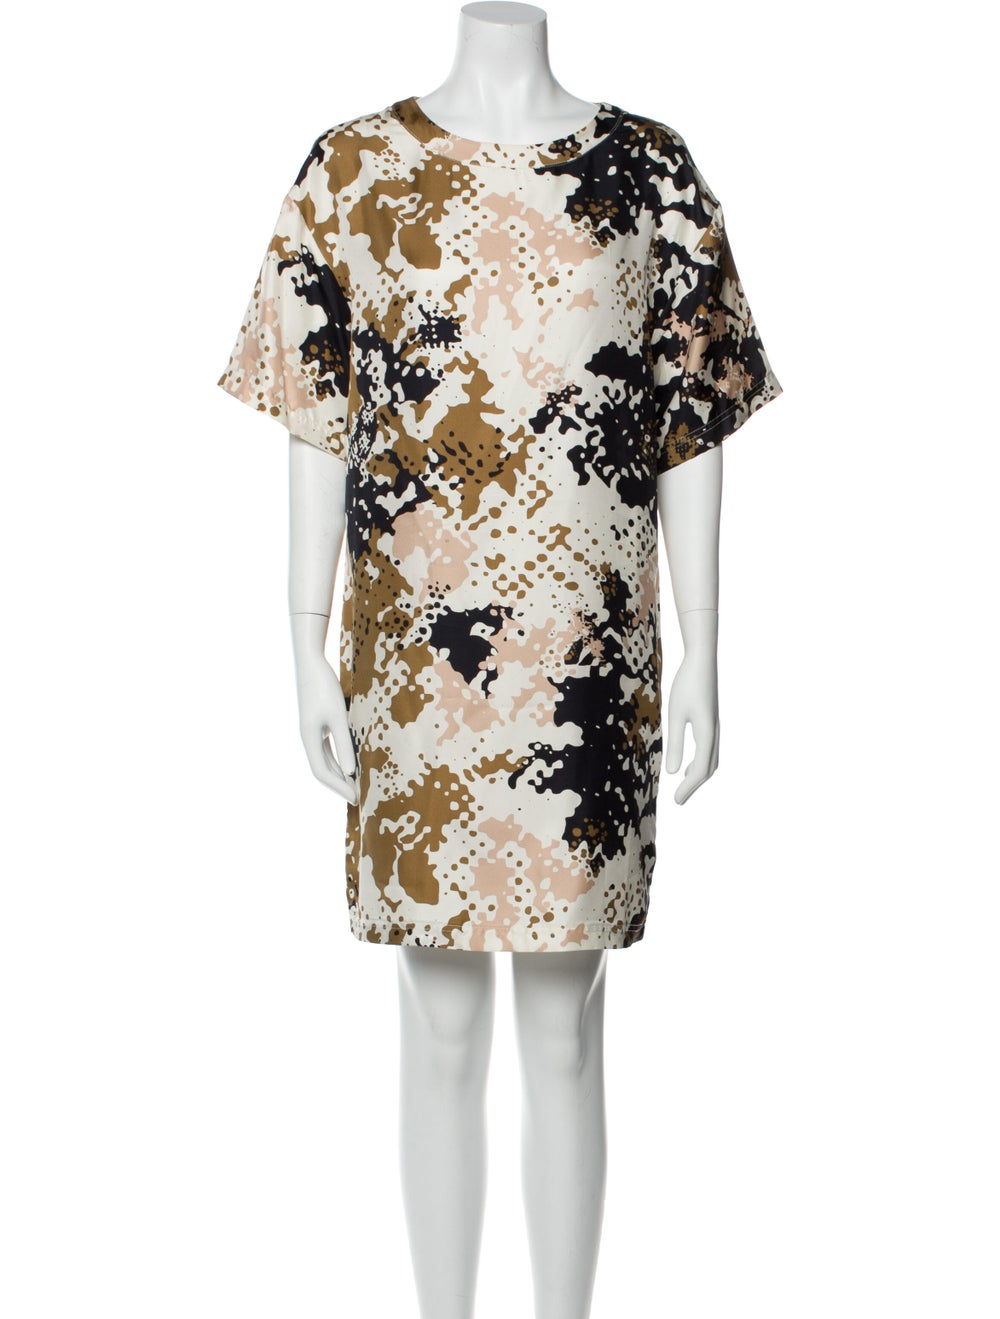 Rag & Bone Silk Mini Dress - image 1